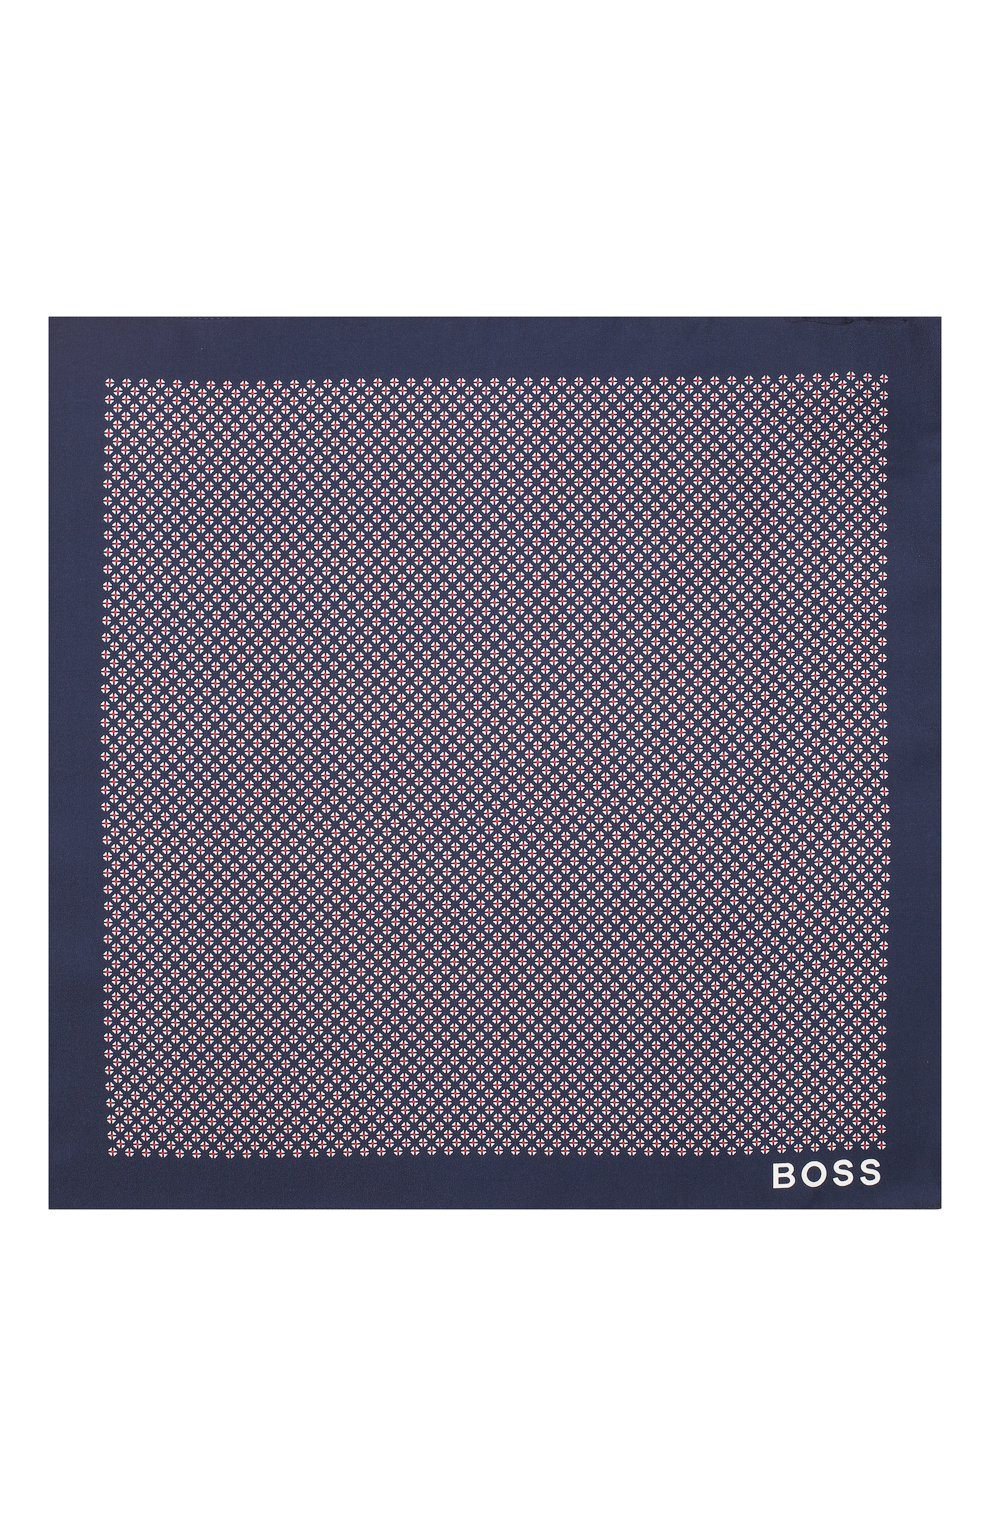 Мужской шелковый платок BOSS темно-синего цвета, арт. 50434750 | Фото 3